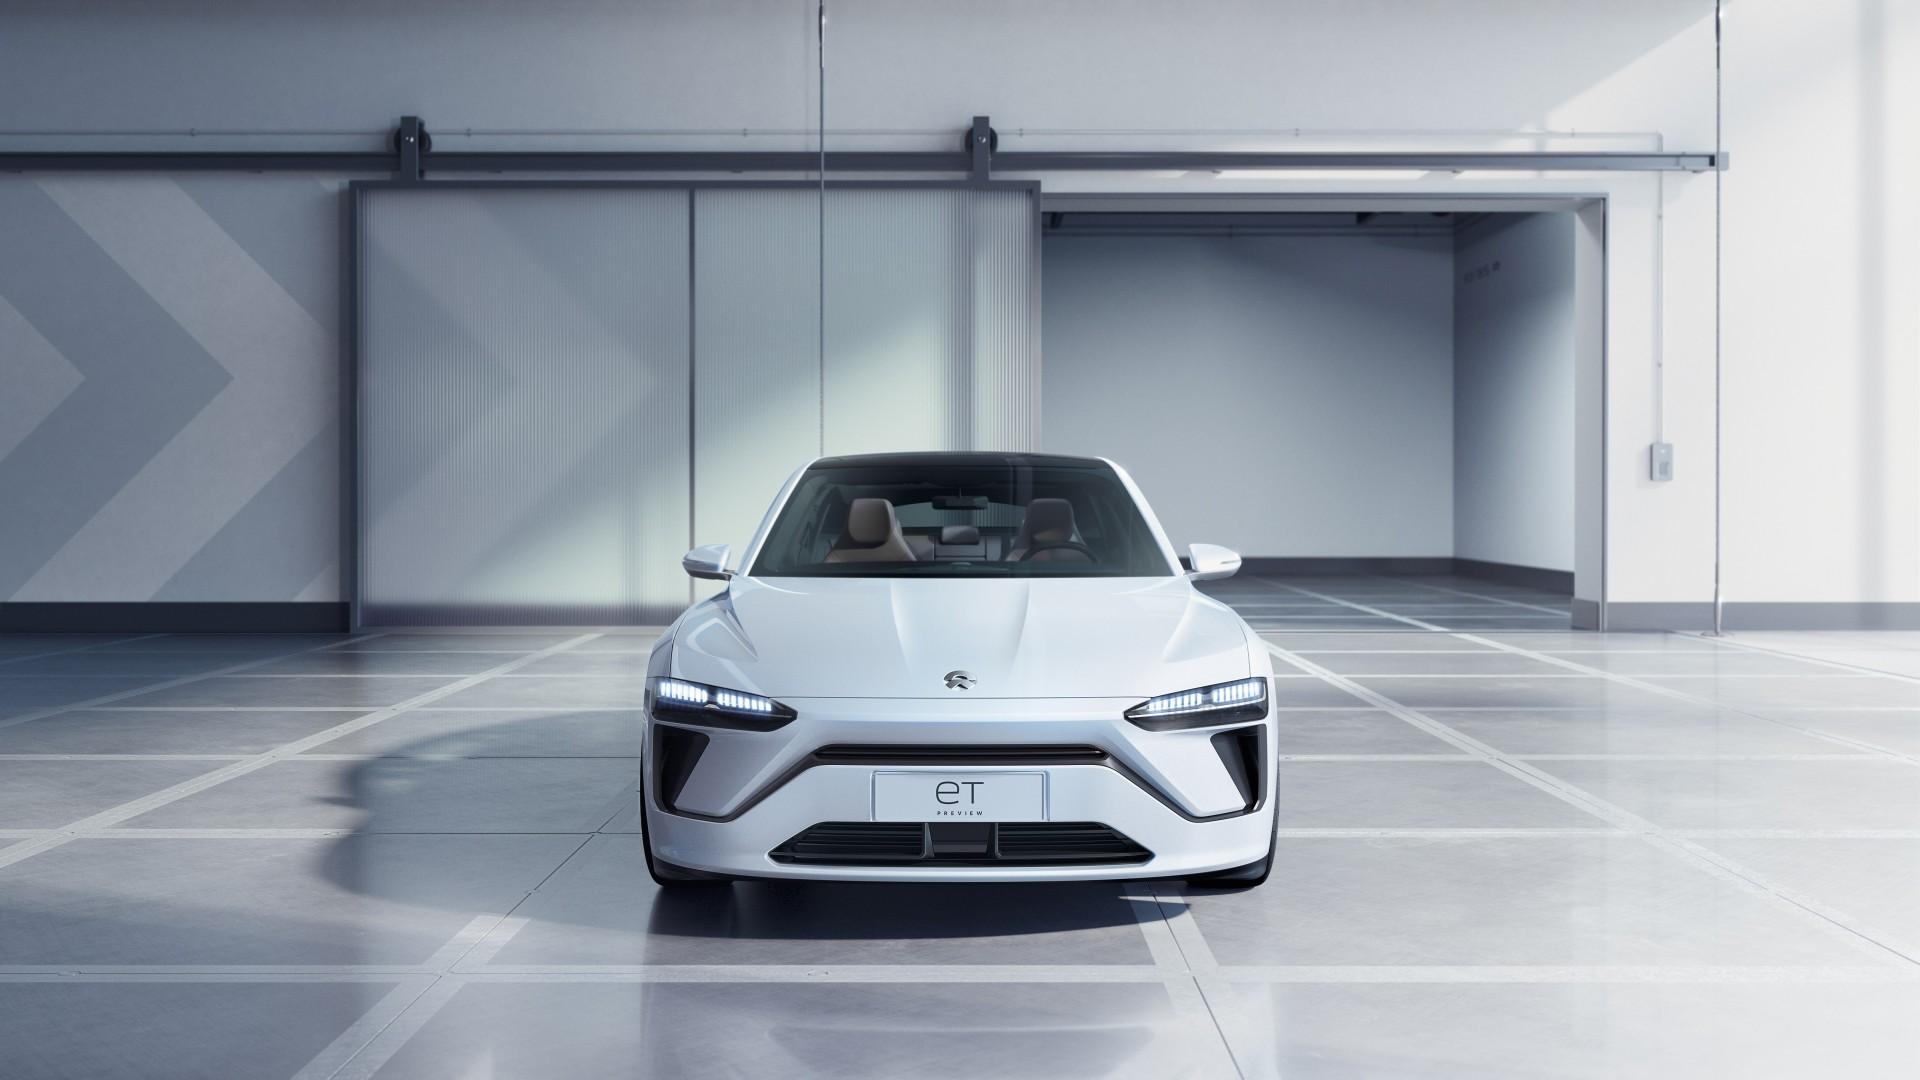 NIO ET Preview Electric Sedan 2019 5K Wallpaper